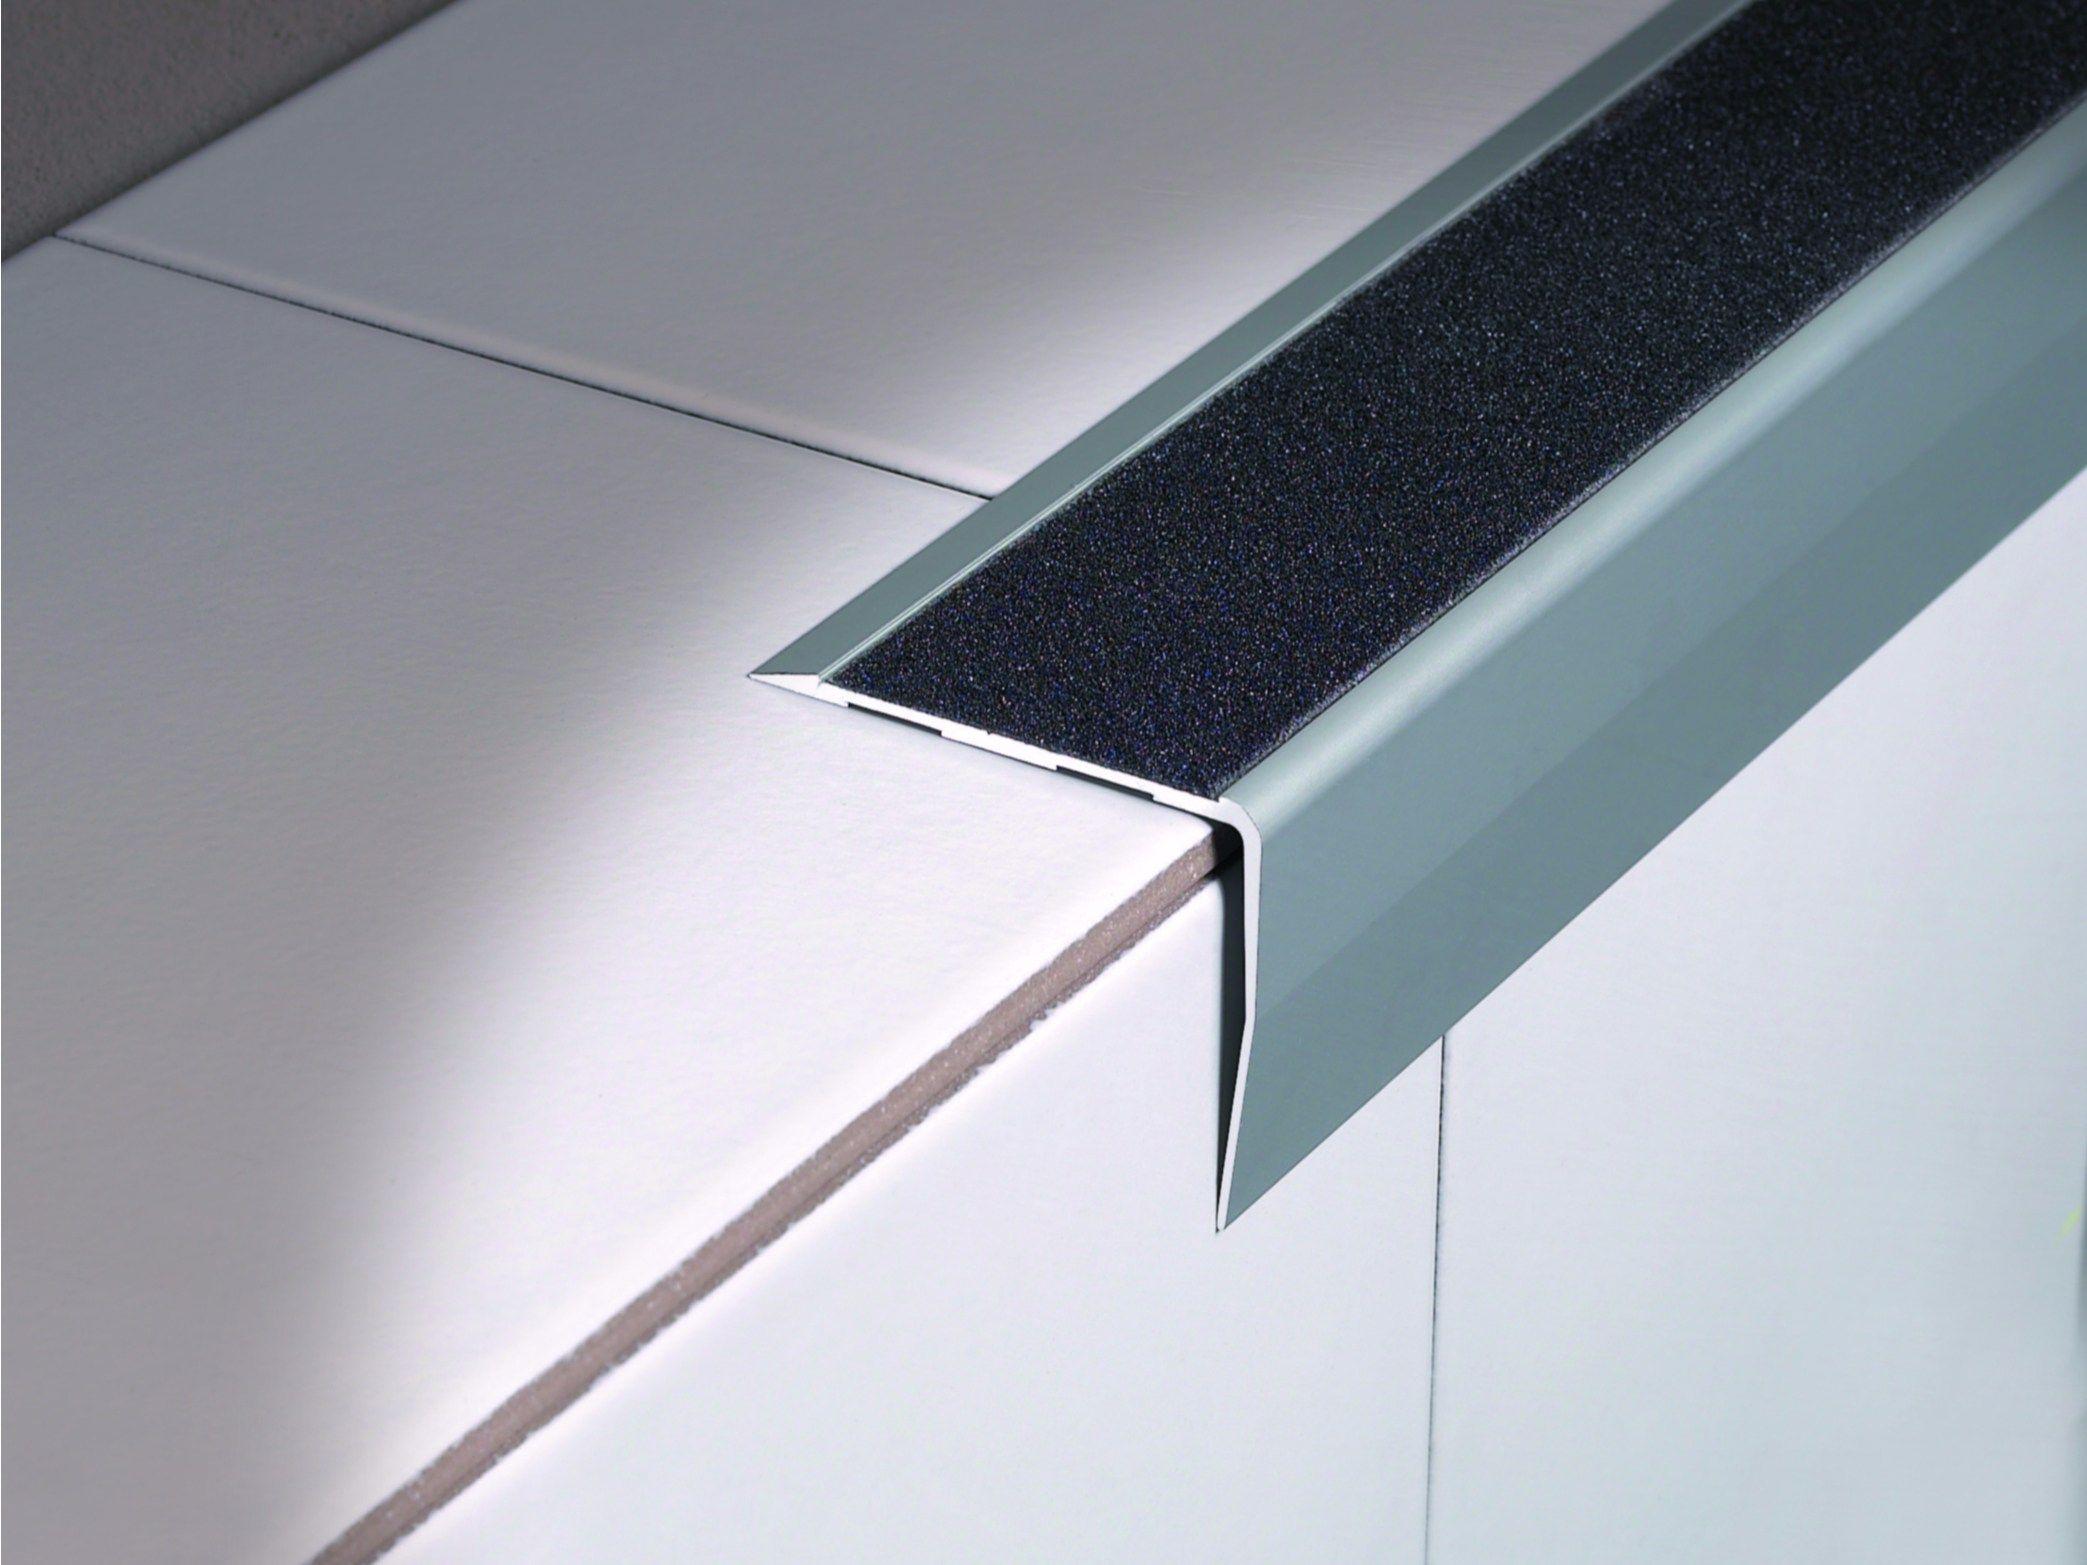 Technical Aluminium Stair Nosing With Anti Slip Strip